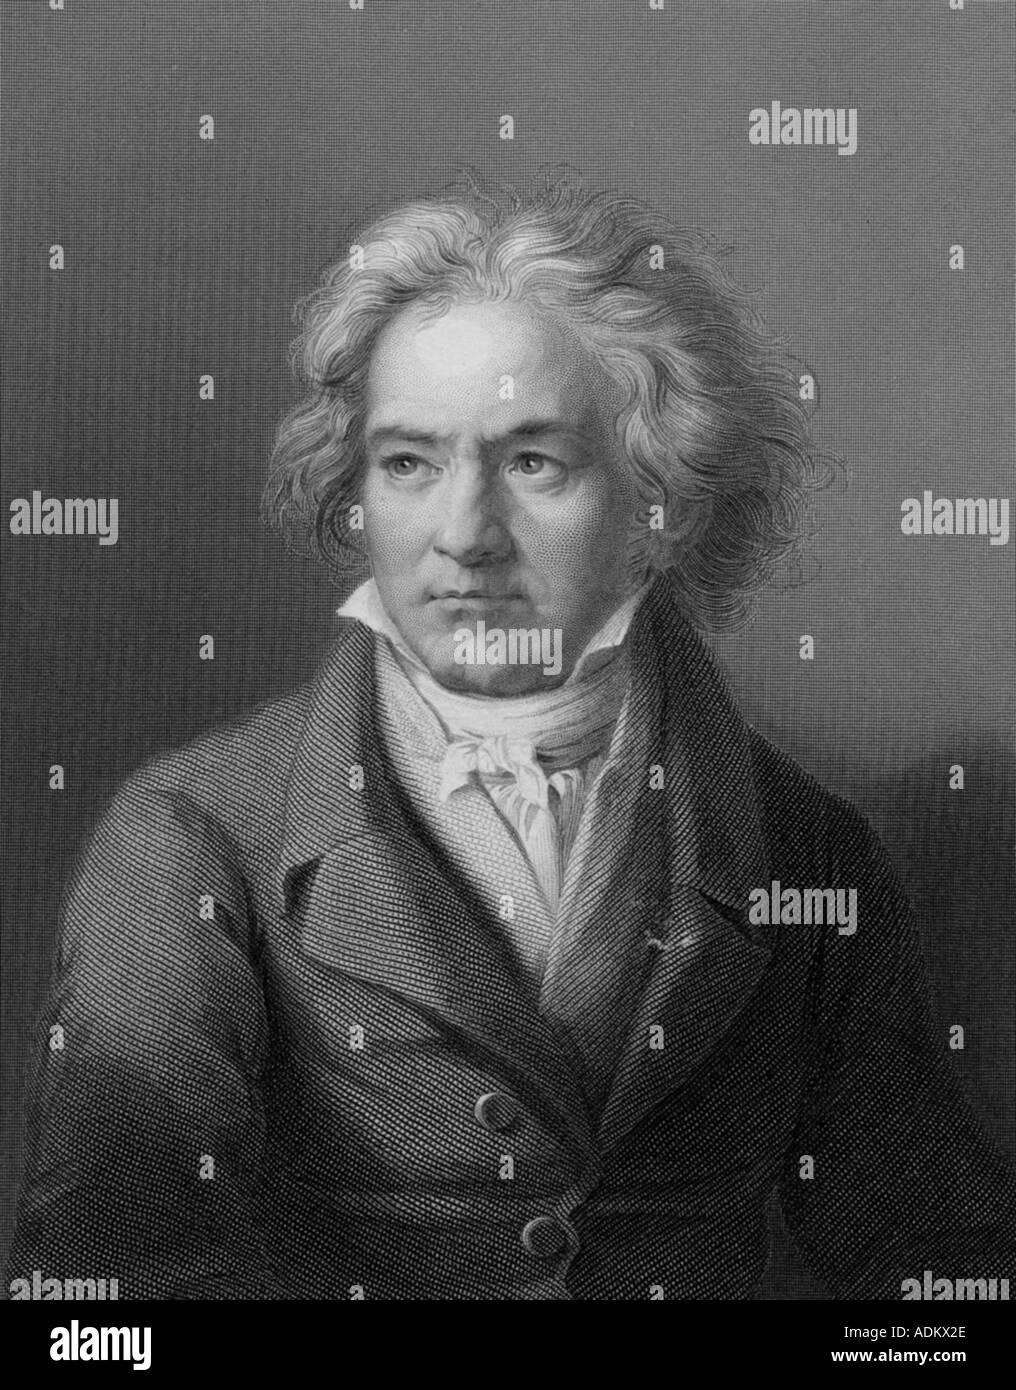 BEETHOVEN LUDWIG VAN BEETHOVEN German composer 1770 1827 - Stock Image